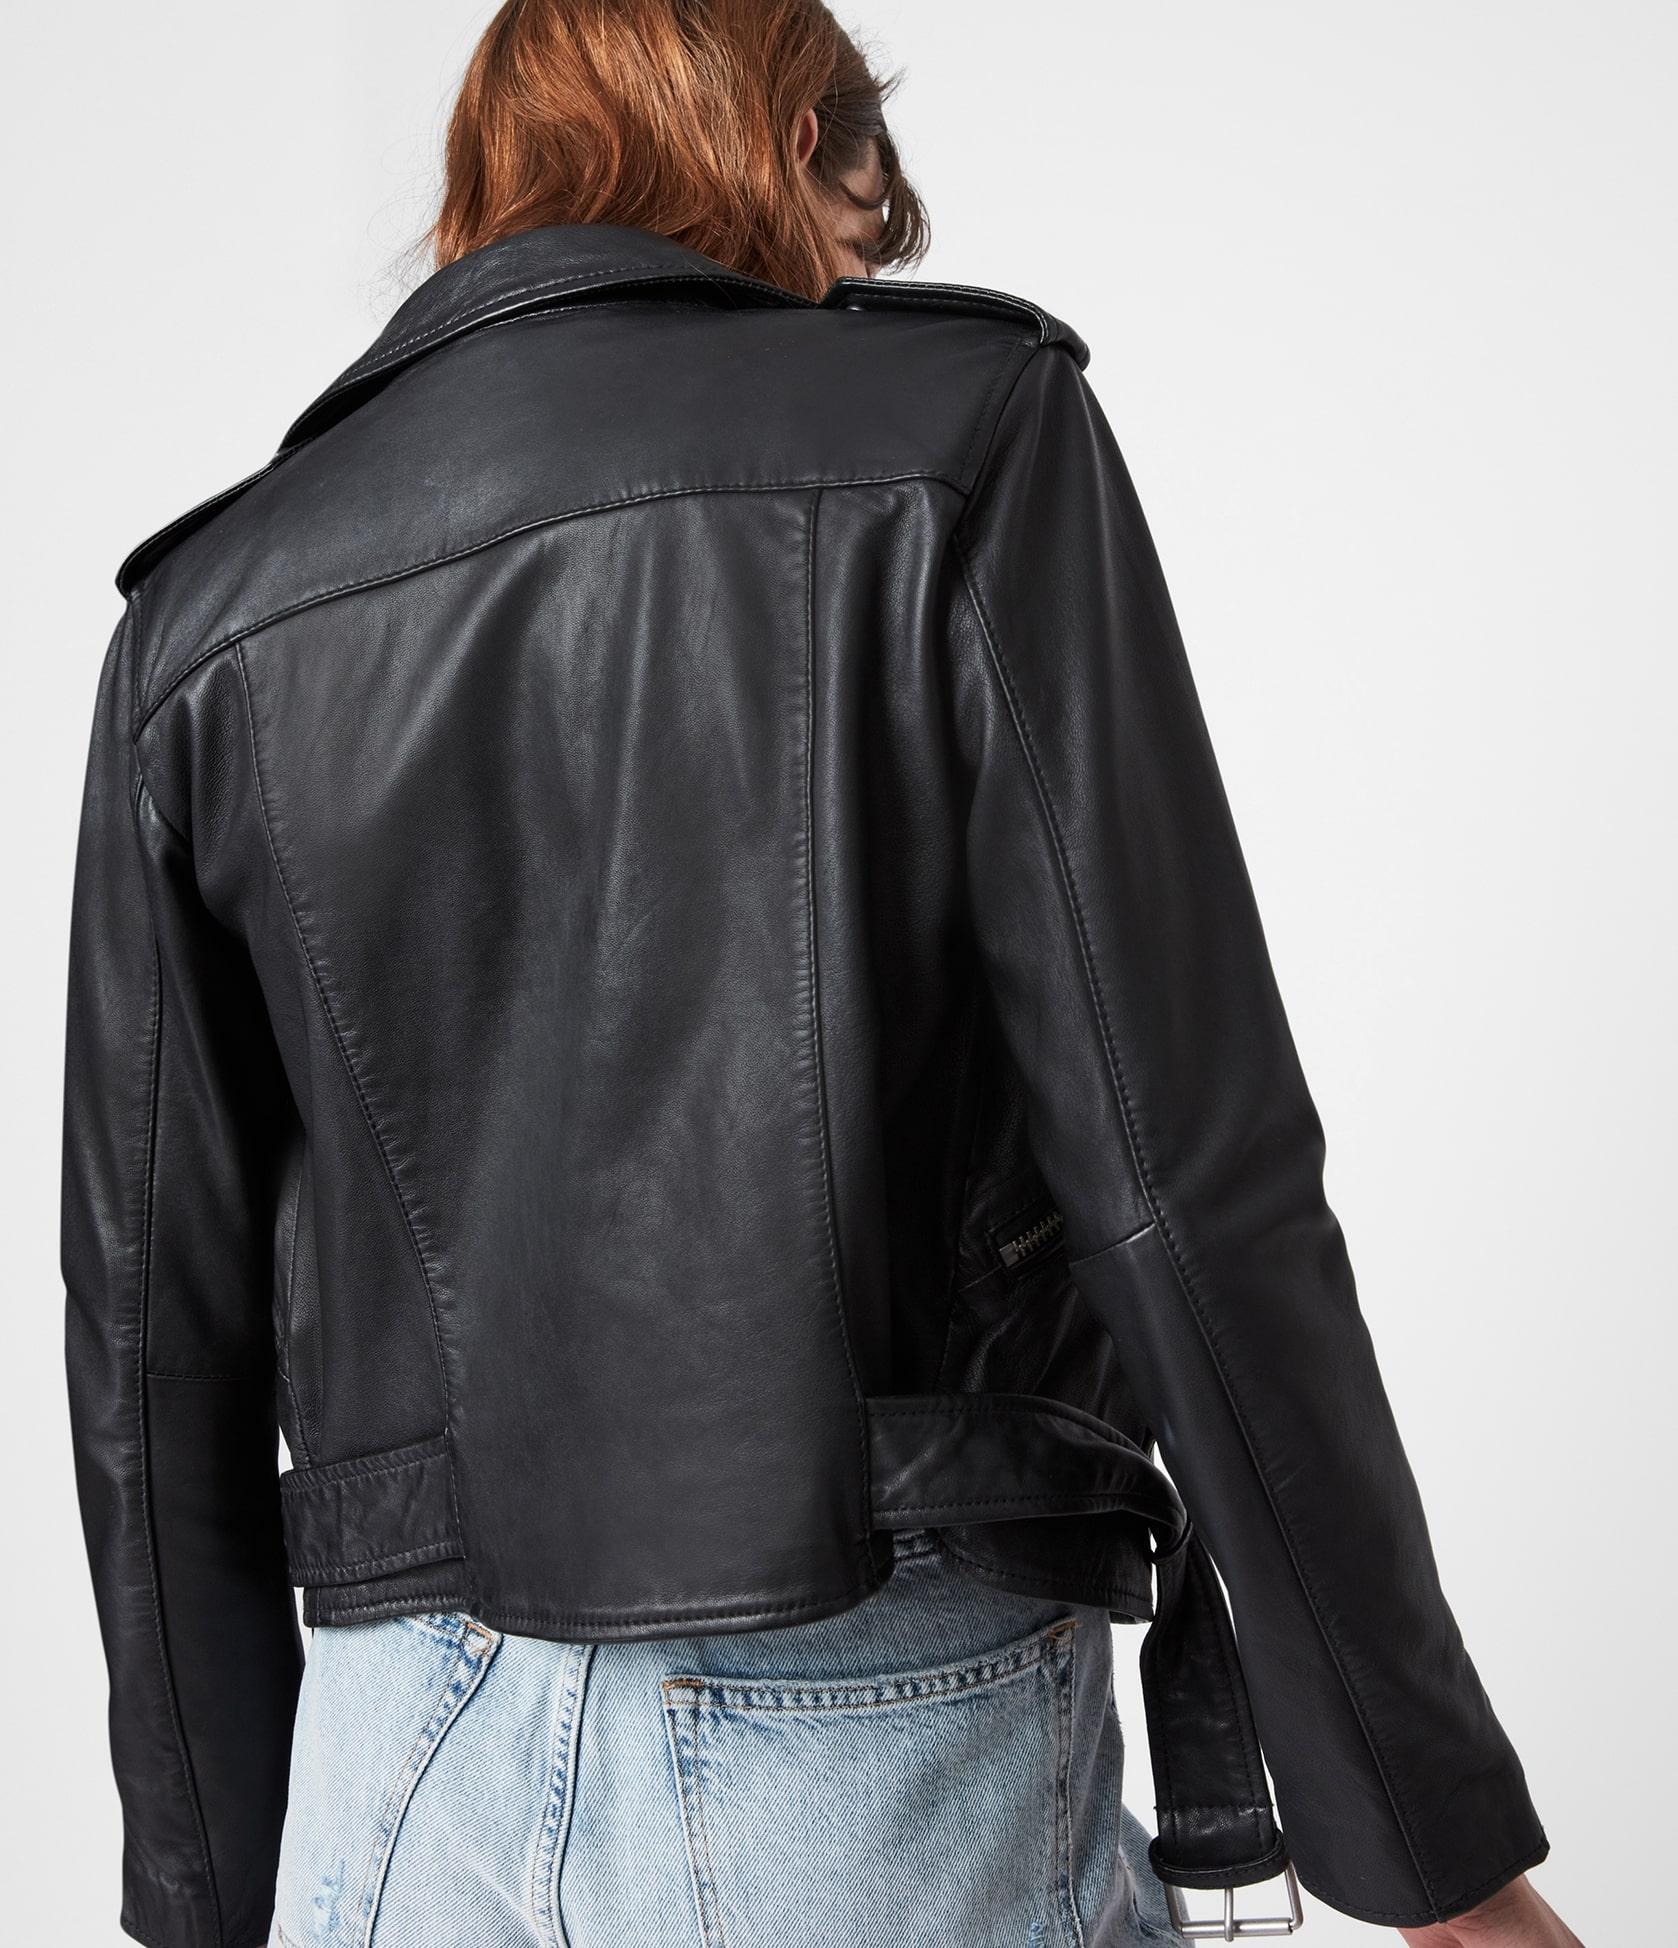 Women's Balfern Leather Jacket - Back View